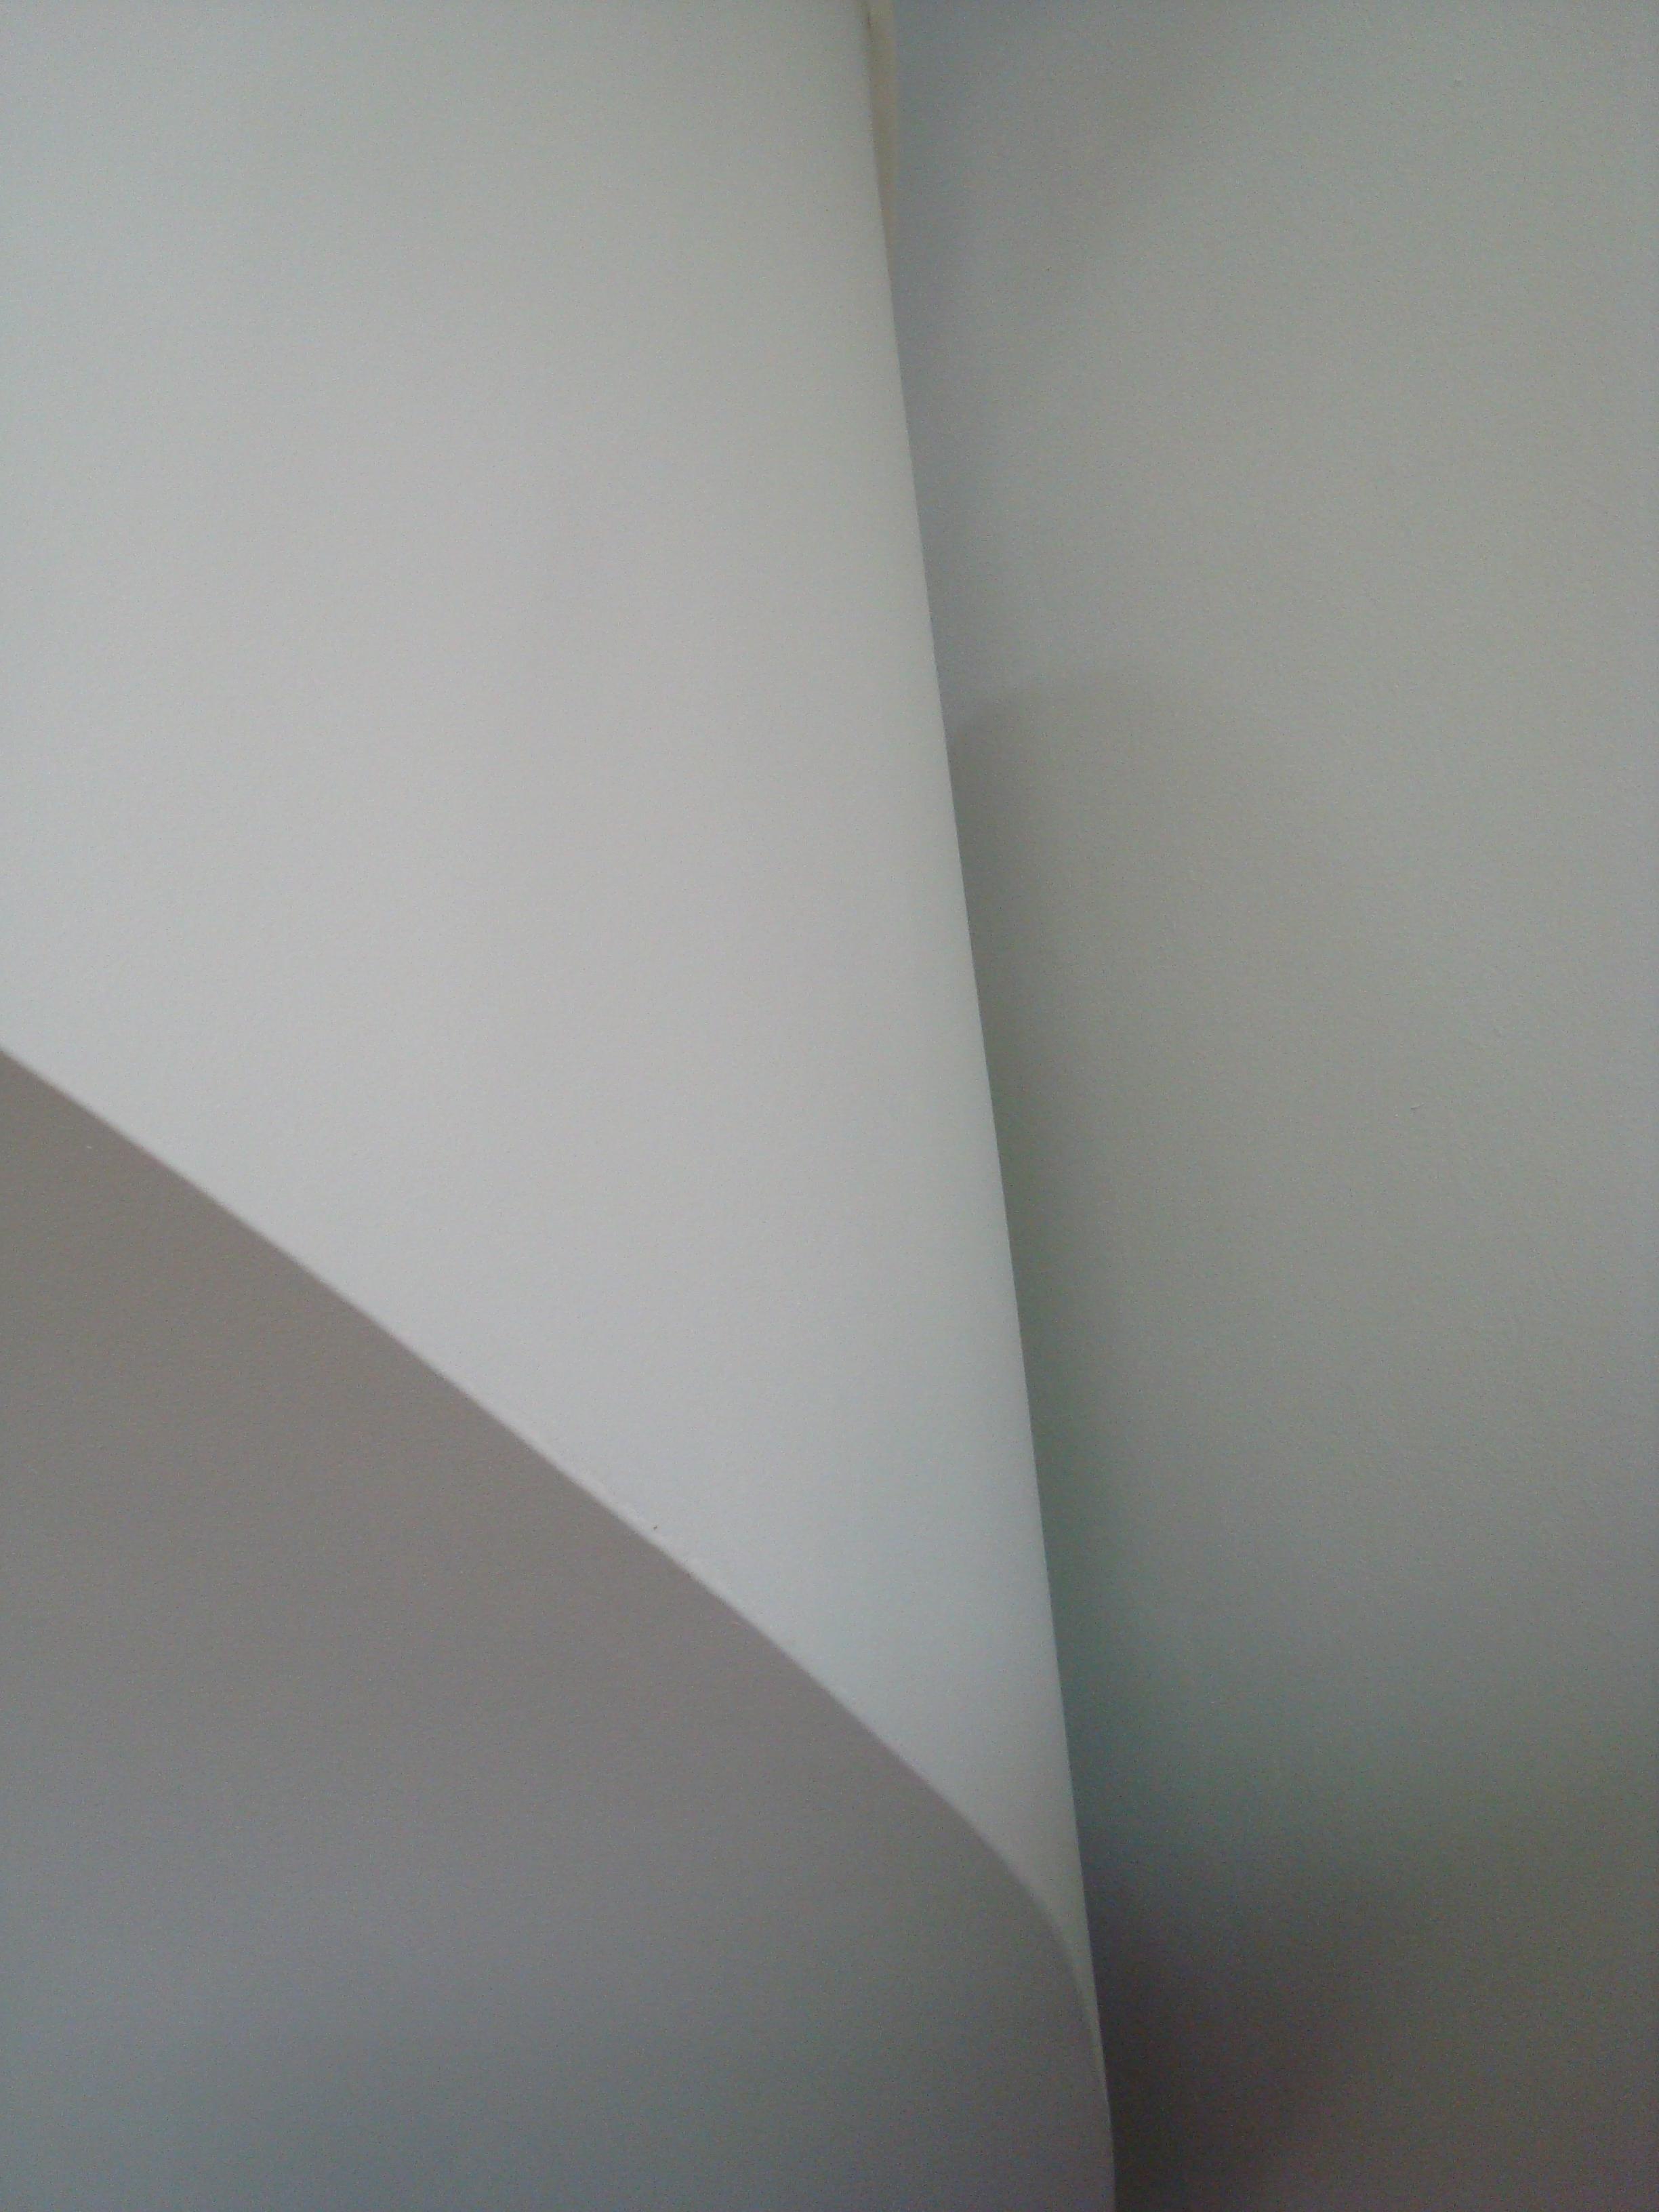 DameronArchitecture_BrooklynHeights_detail4.JPG